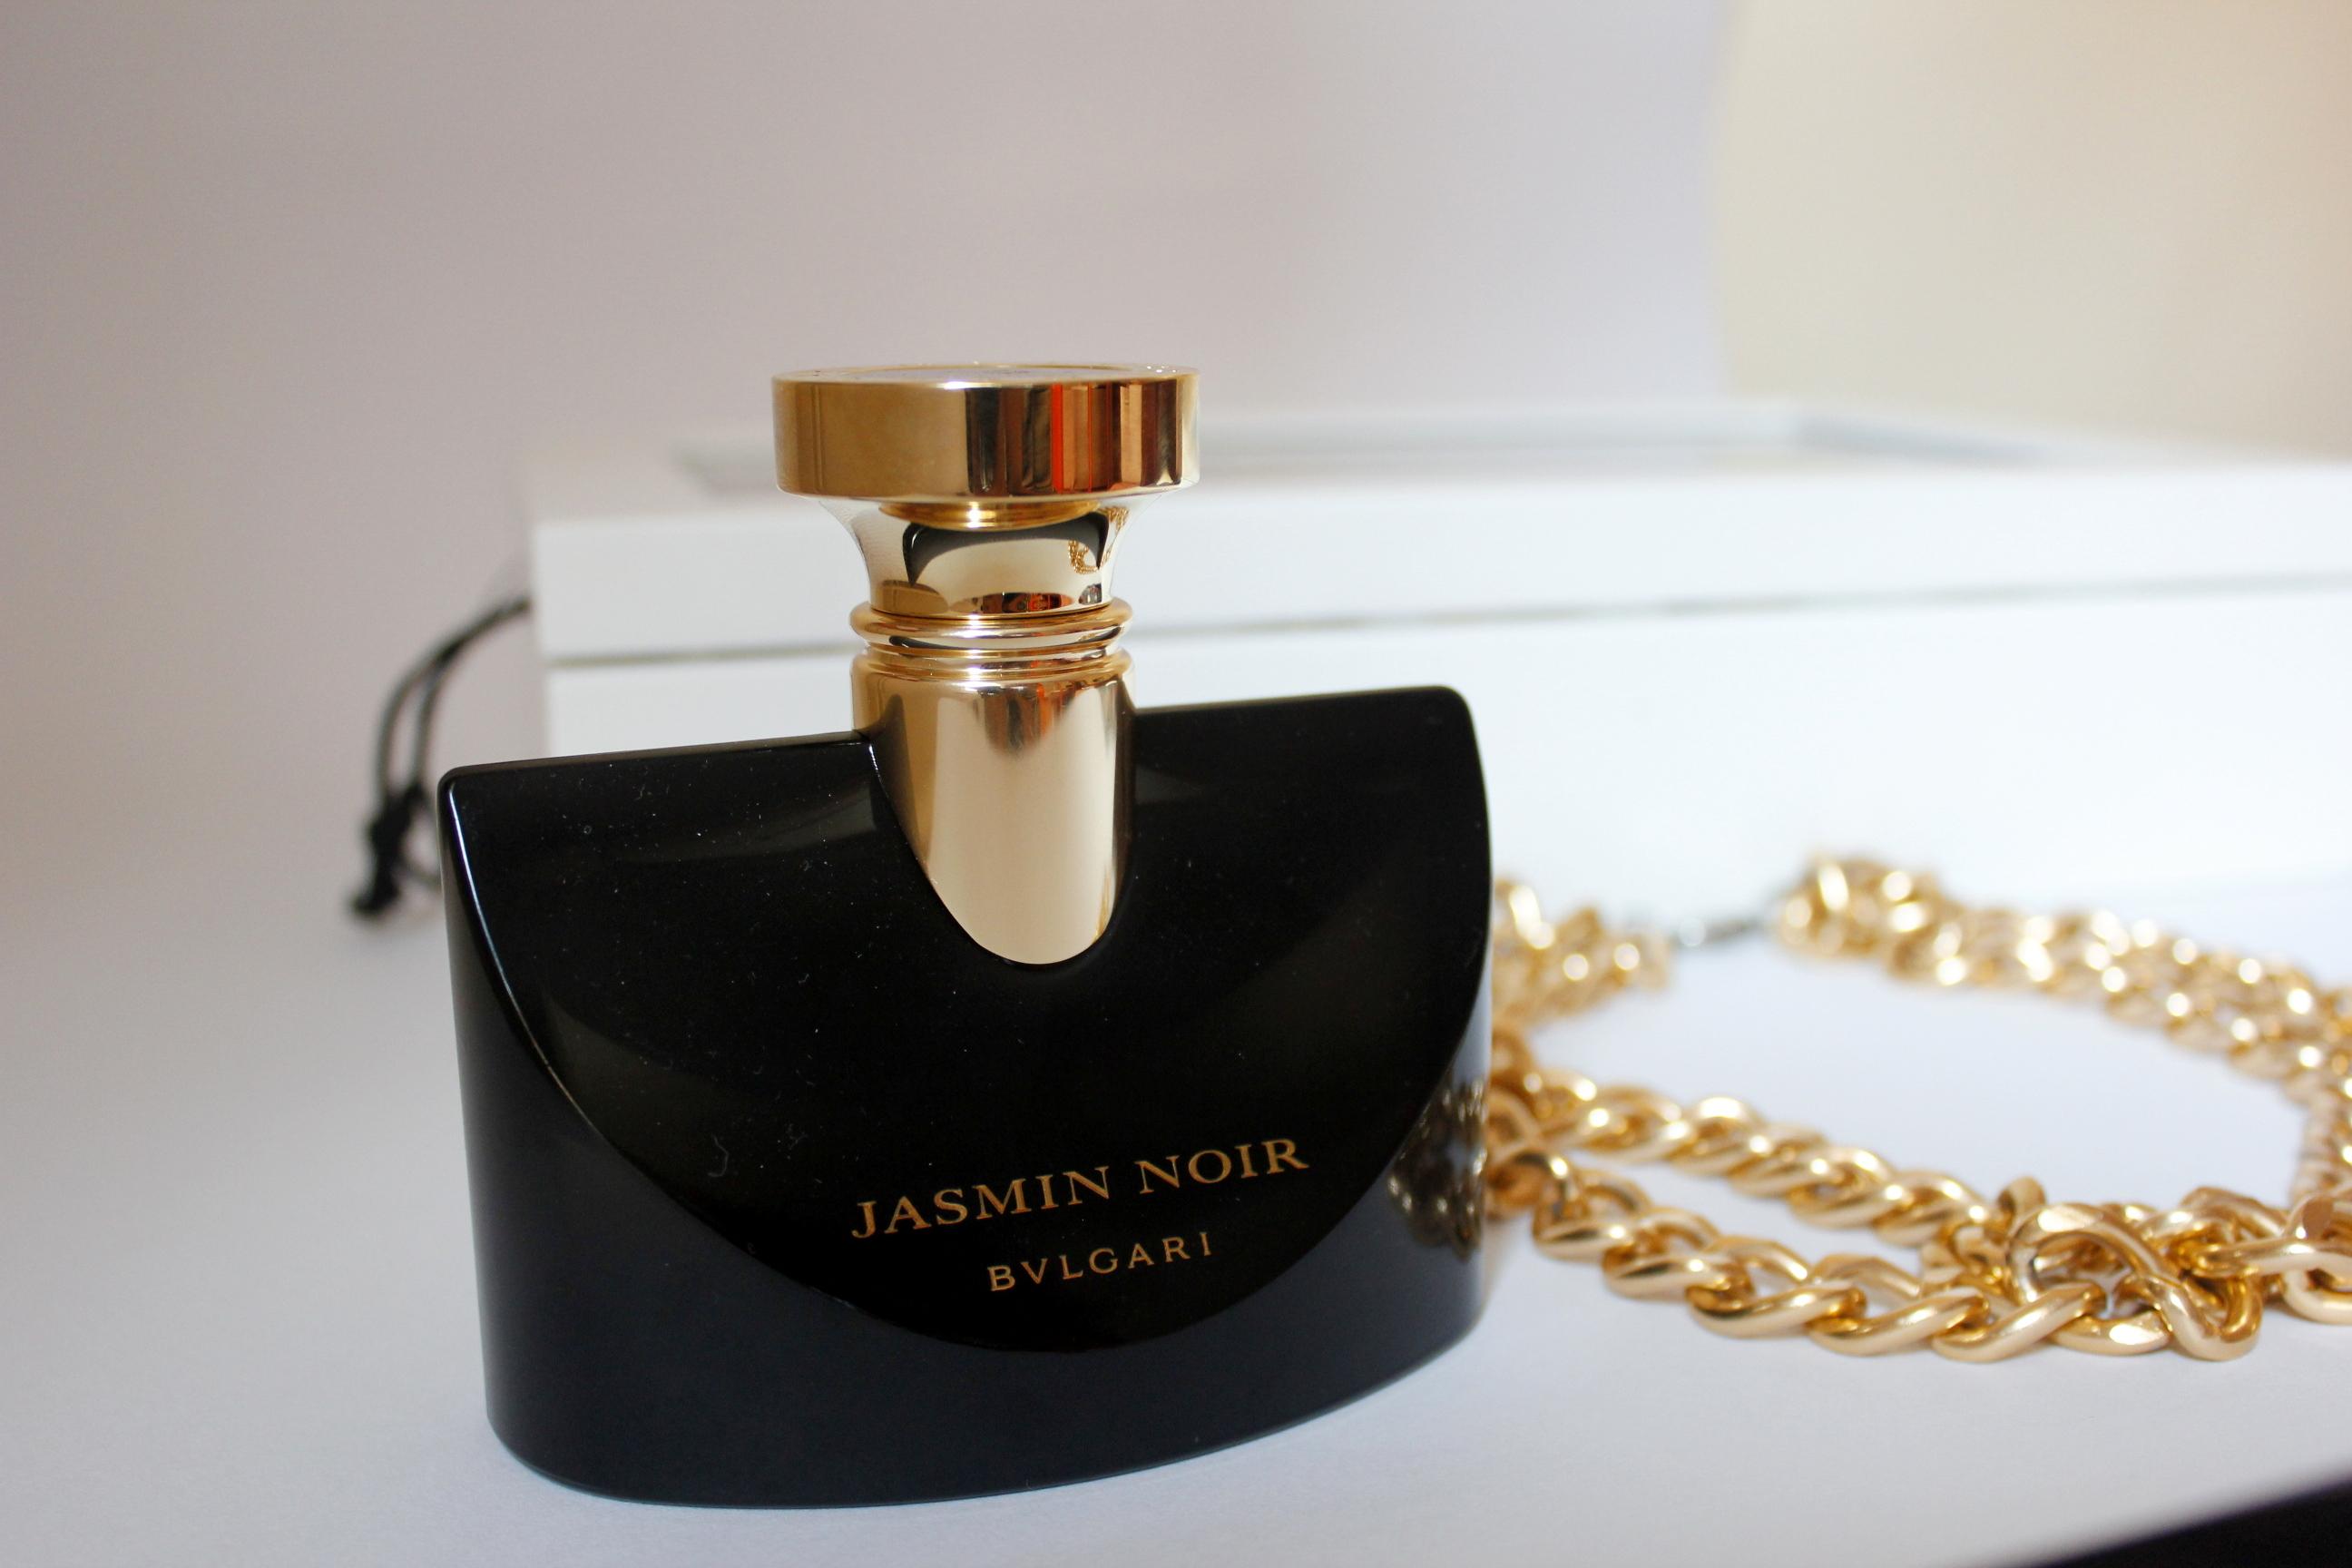 Jasmin Noir от Bvlgari